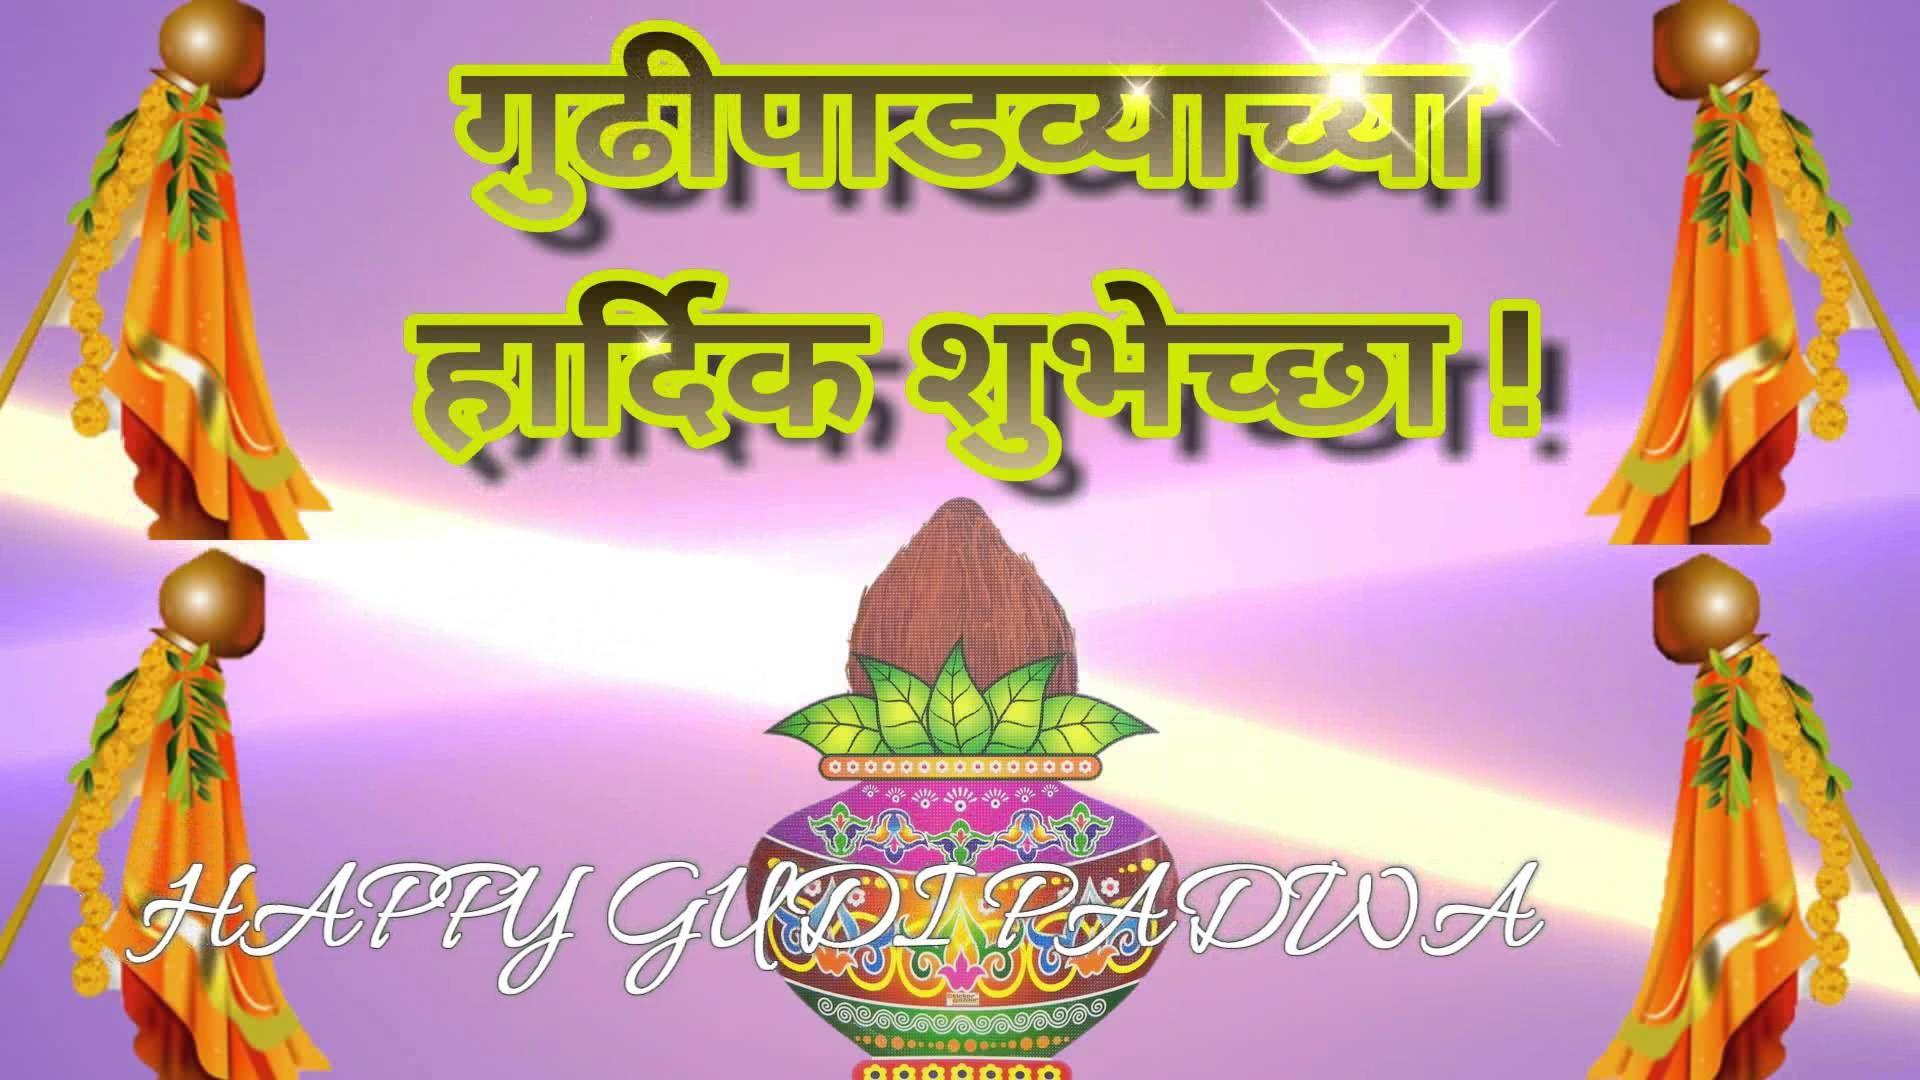 Gudi Padwa 2016 Wishes Gudi Padwa Whatsapp Gudi Padwa Greetings